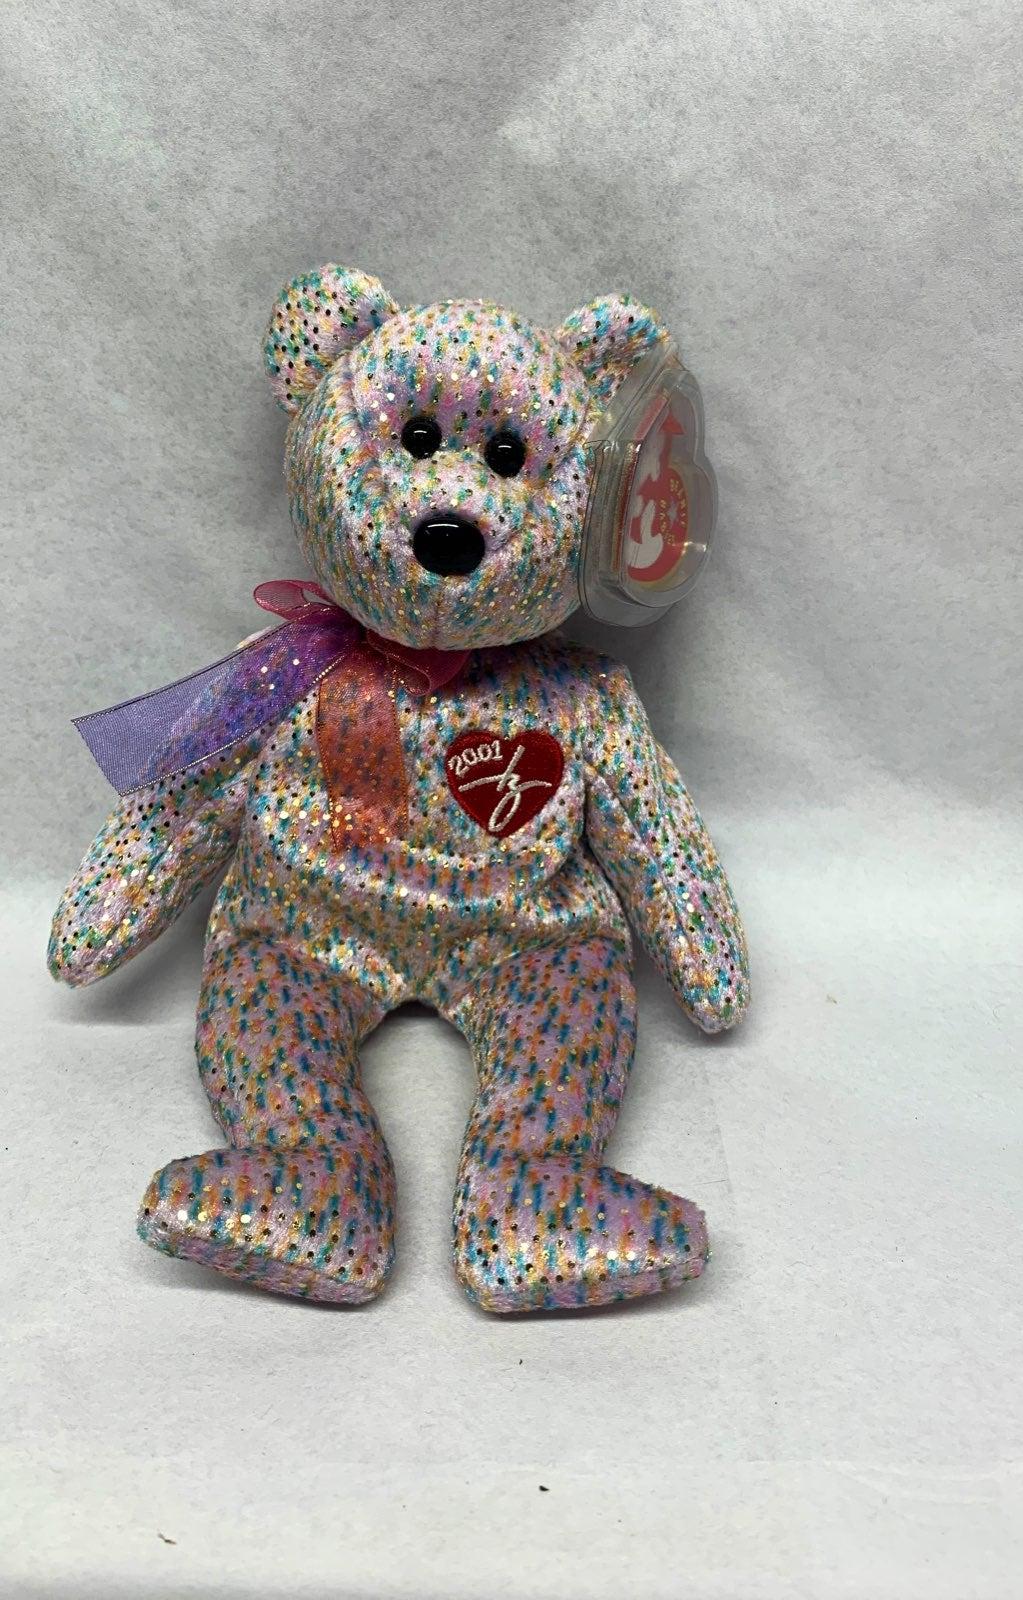 2001 TY Beanie Baby signature Bear